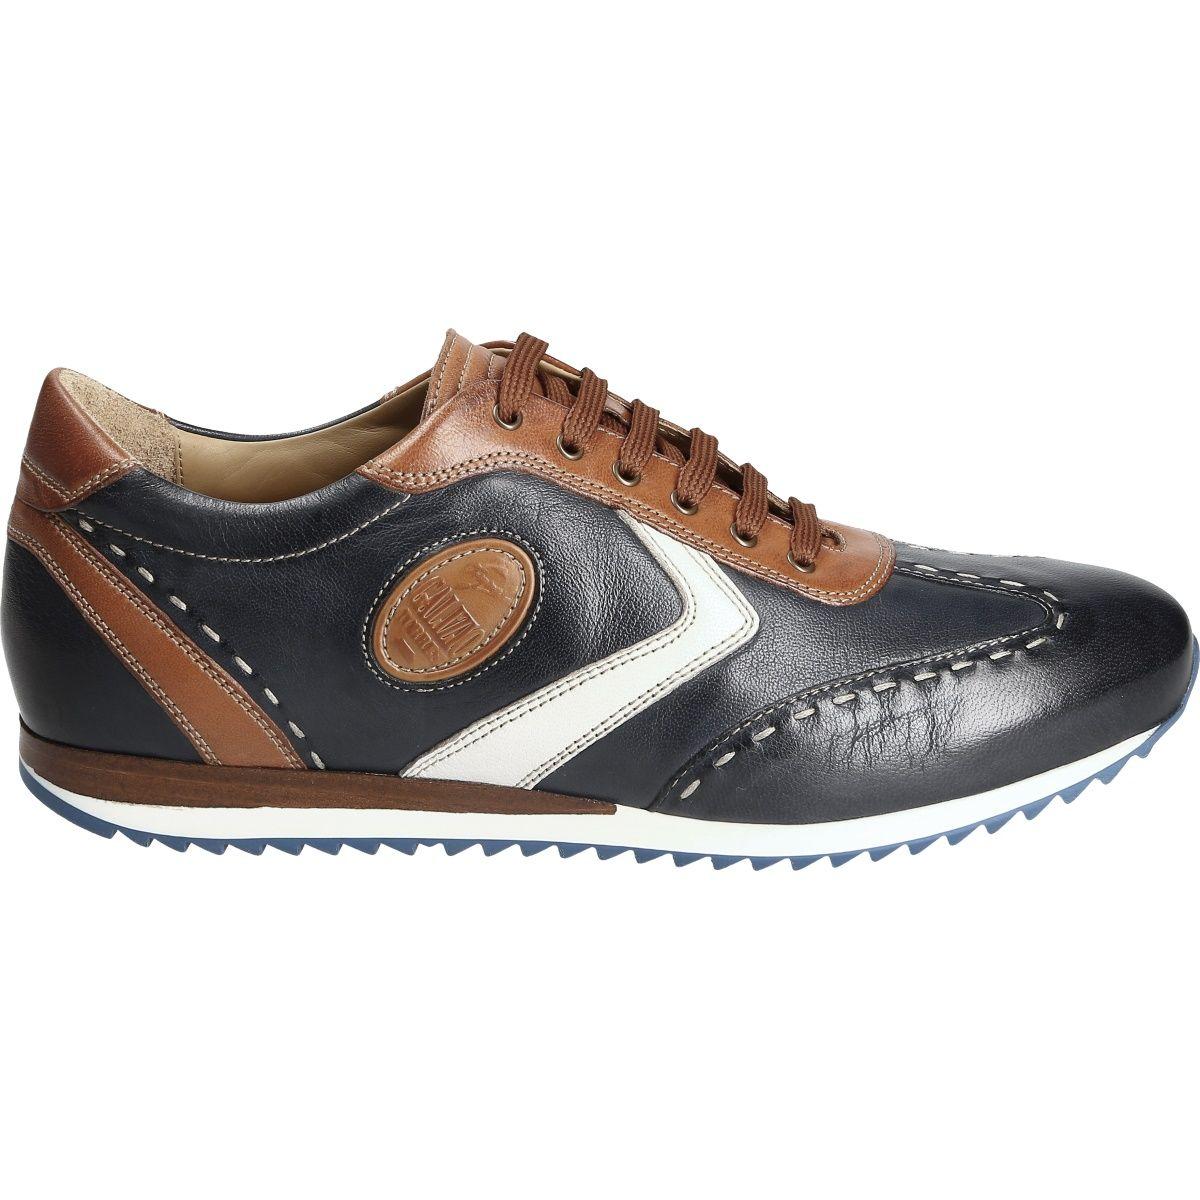 Galizio Torresi 316380 V17015 Men S Shoes Lace Ups Buy